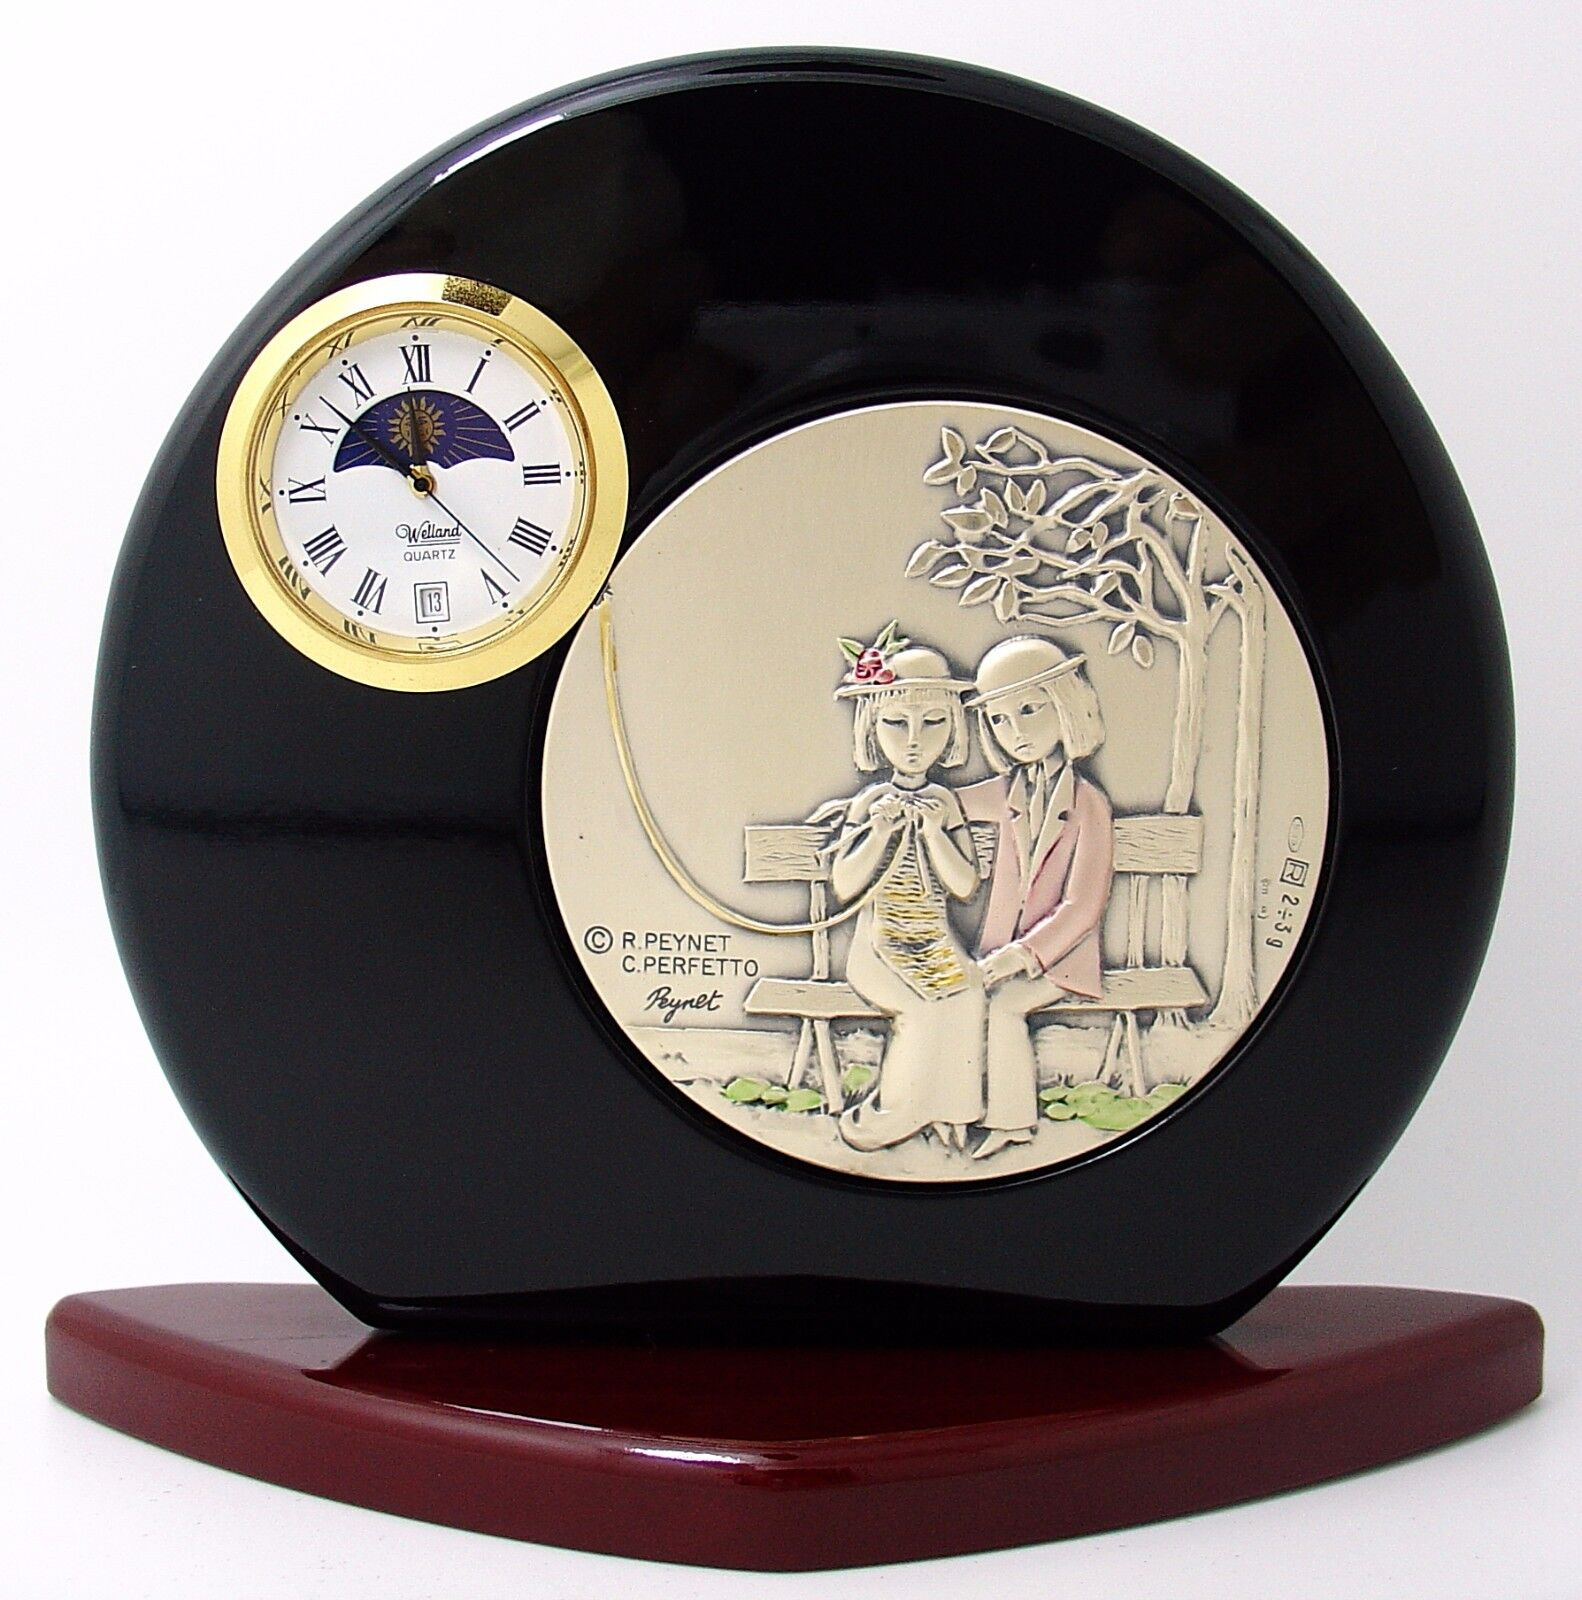 VALENTINO E VALENTINA RAYMOND VINTAGE PEYNET OROLOGIO ARGENTO SILVER CLOCK VINTAGE RAYMOND 006a0e